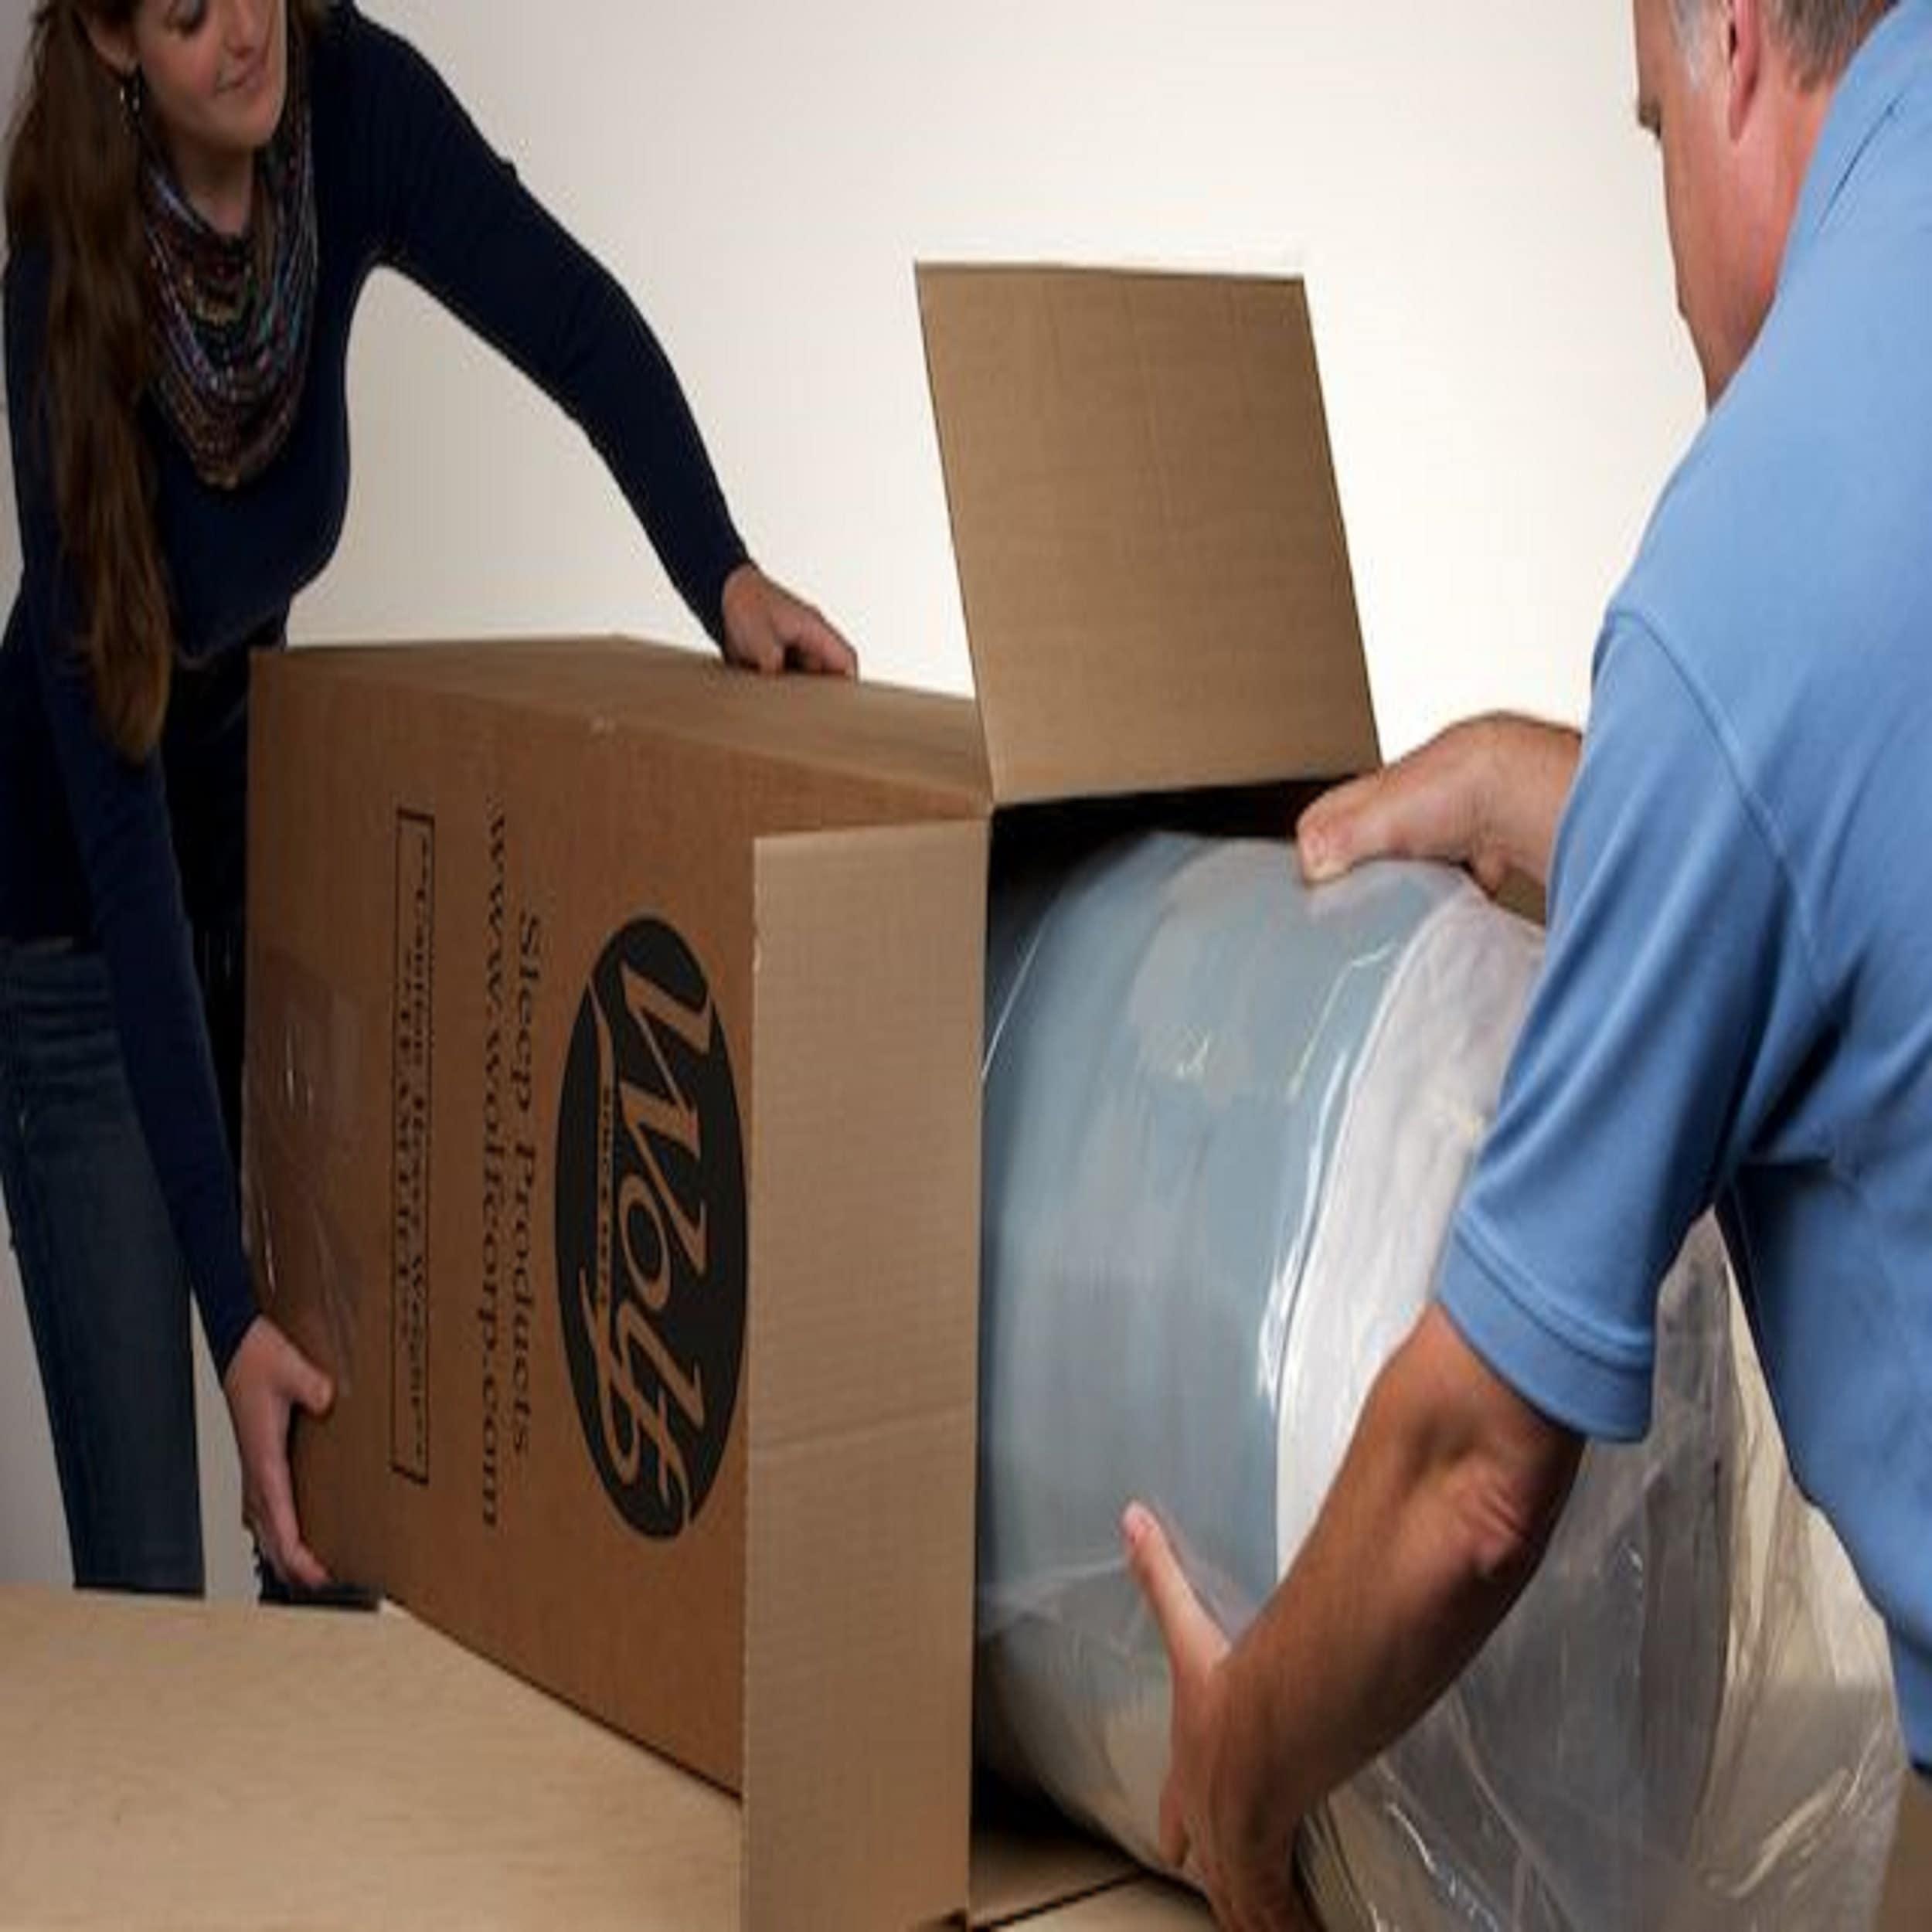 Serta Florence Futon Frame And Chestnut Cotton Certipur Foam Mattress Free Shipping Today Com 10822320